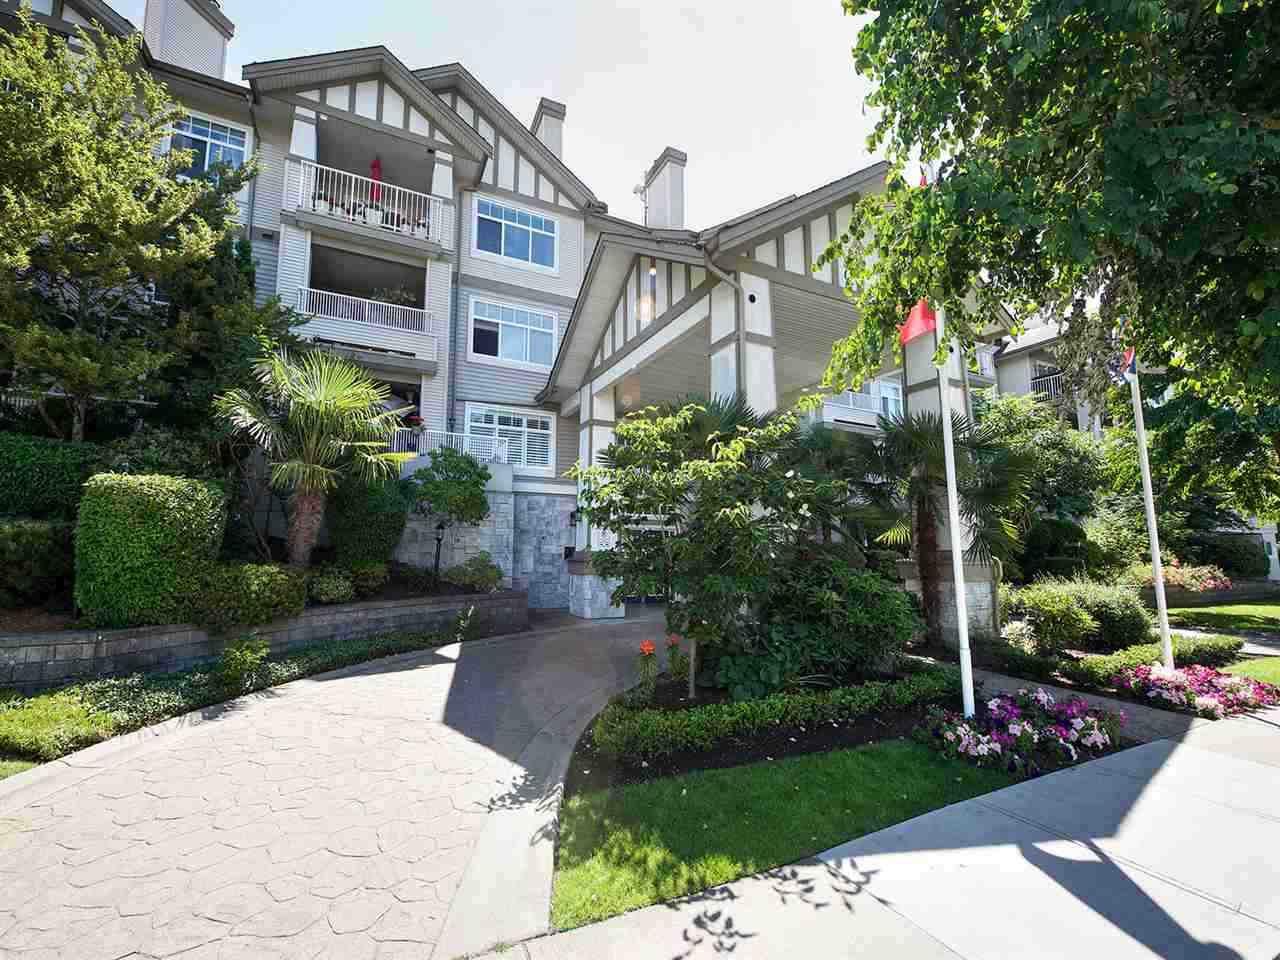 Main Photo: 202 4770 52A STREET in : Delta Manor Condo for sale : MLS®# R2229640